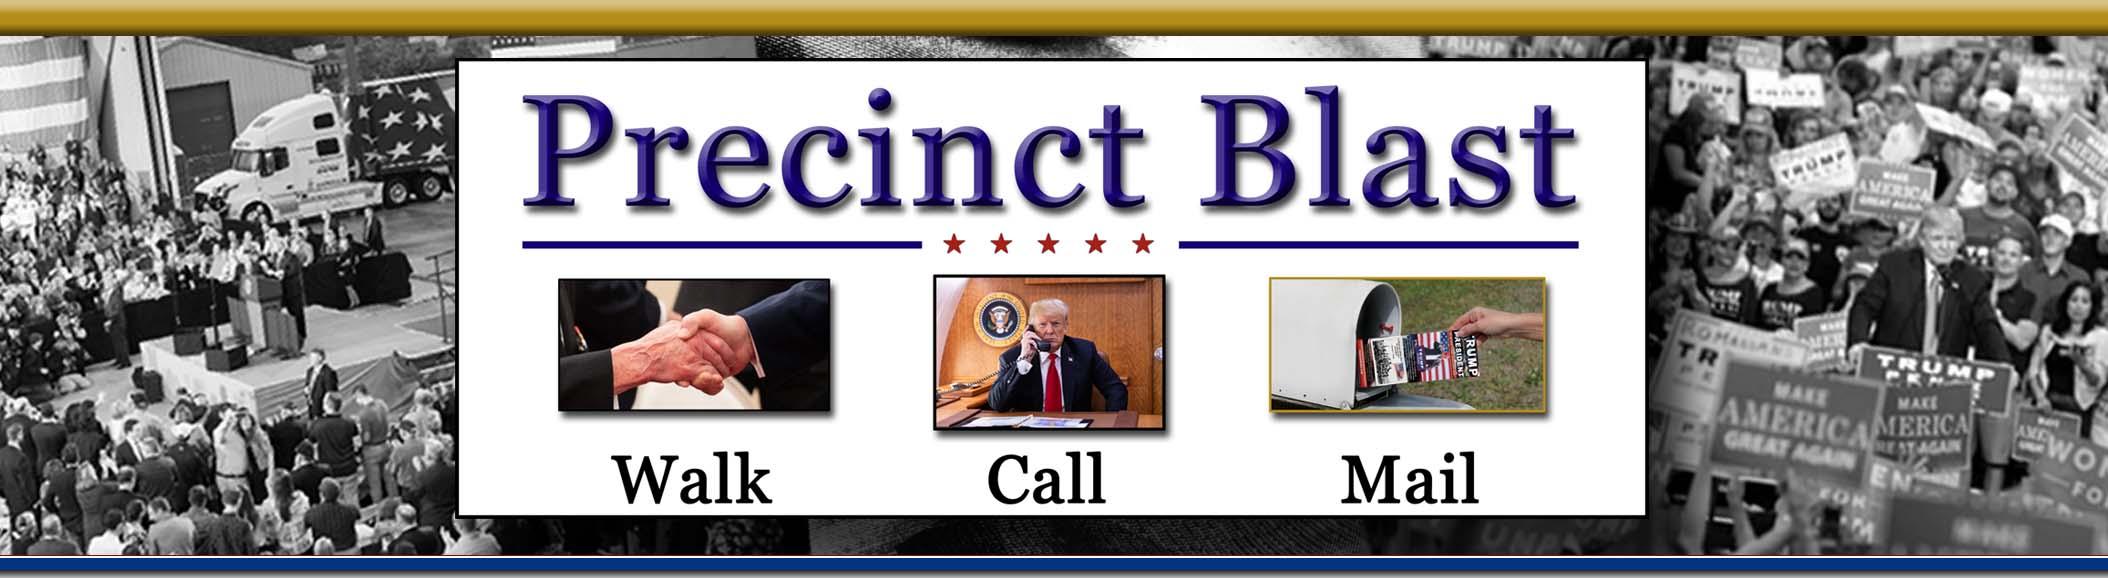 Precinct Blast